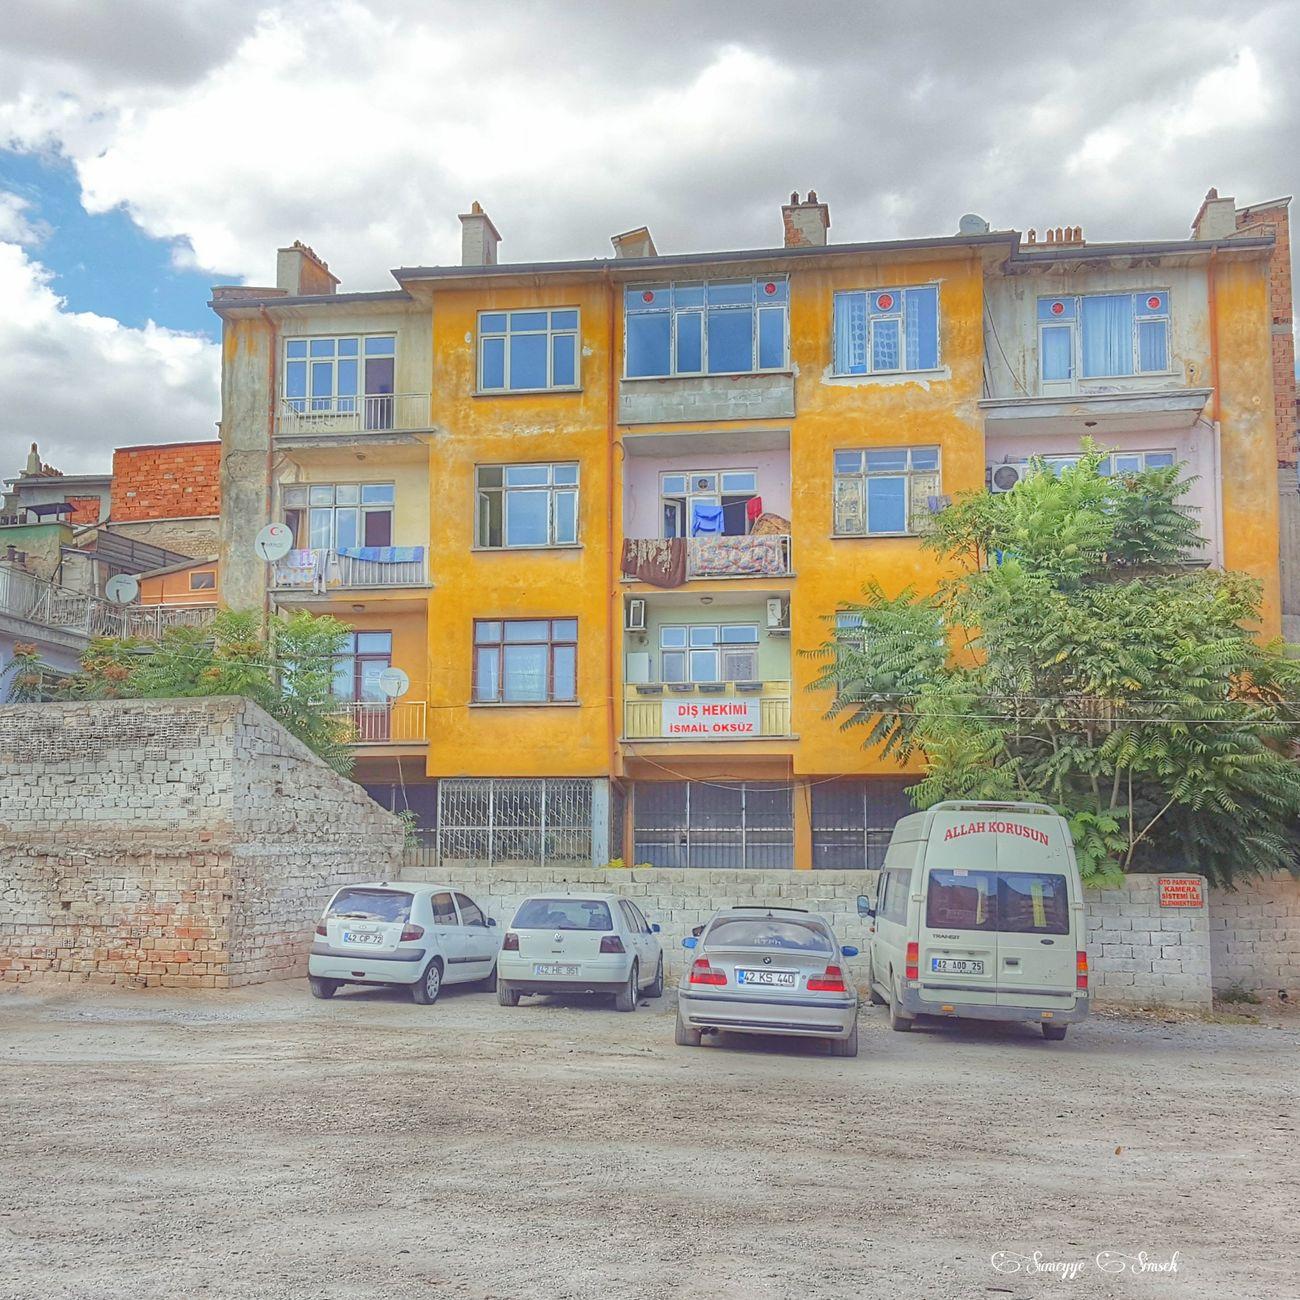 Türkiye Buildings Apartment City Life Outdoors Street Residential Structure Window Day Konyadan Turkeyphotooftheday Konyagram Konya Worldwide_shot